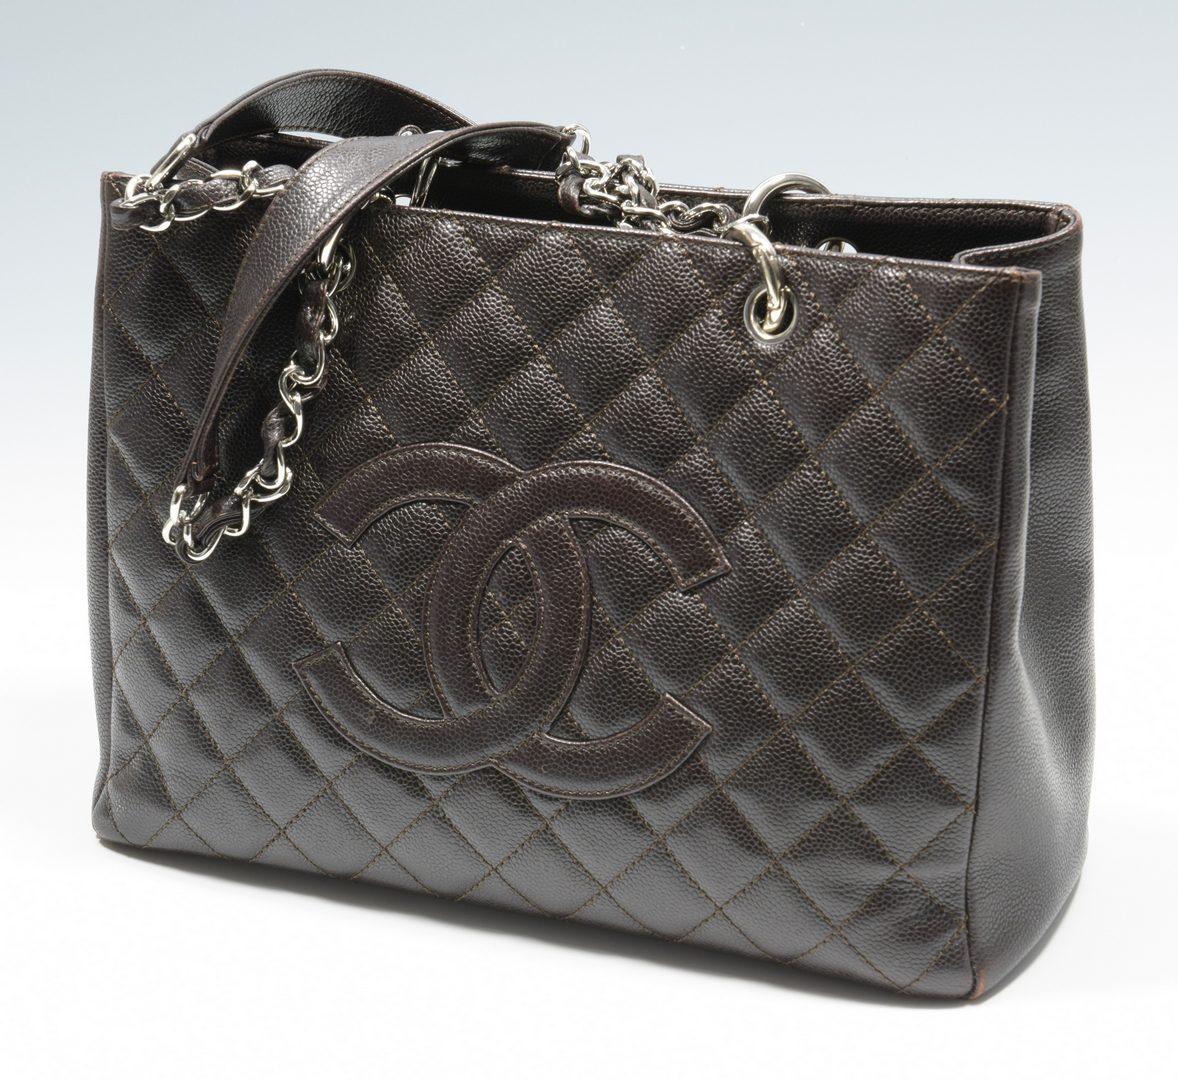 Lot 921: Chanel Dark Brown Grand Shopping Tote